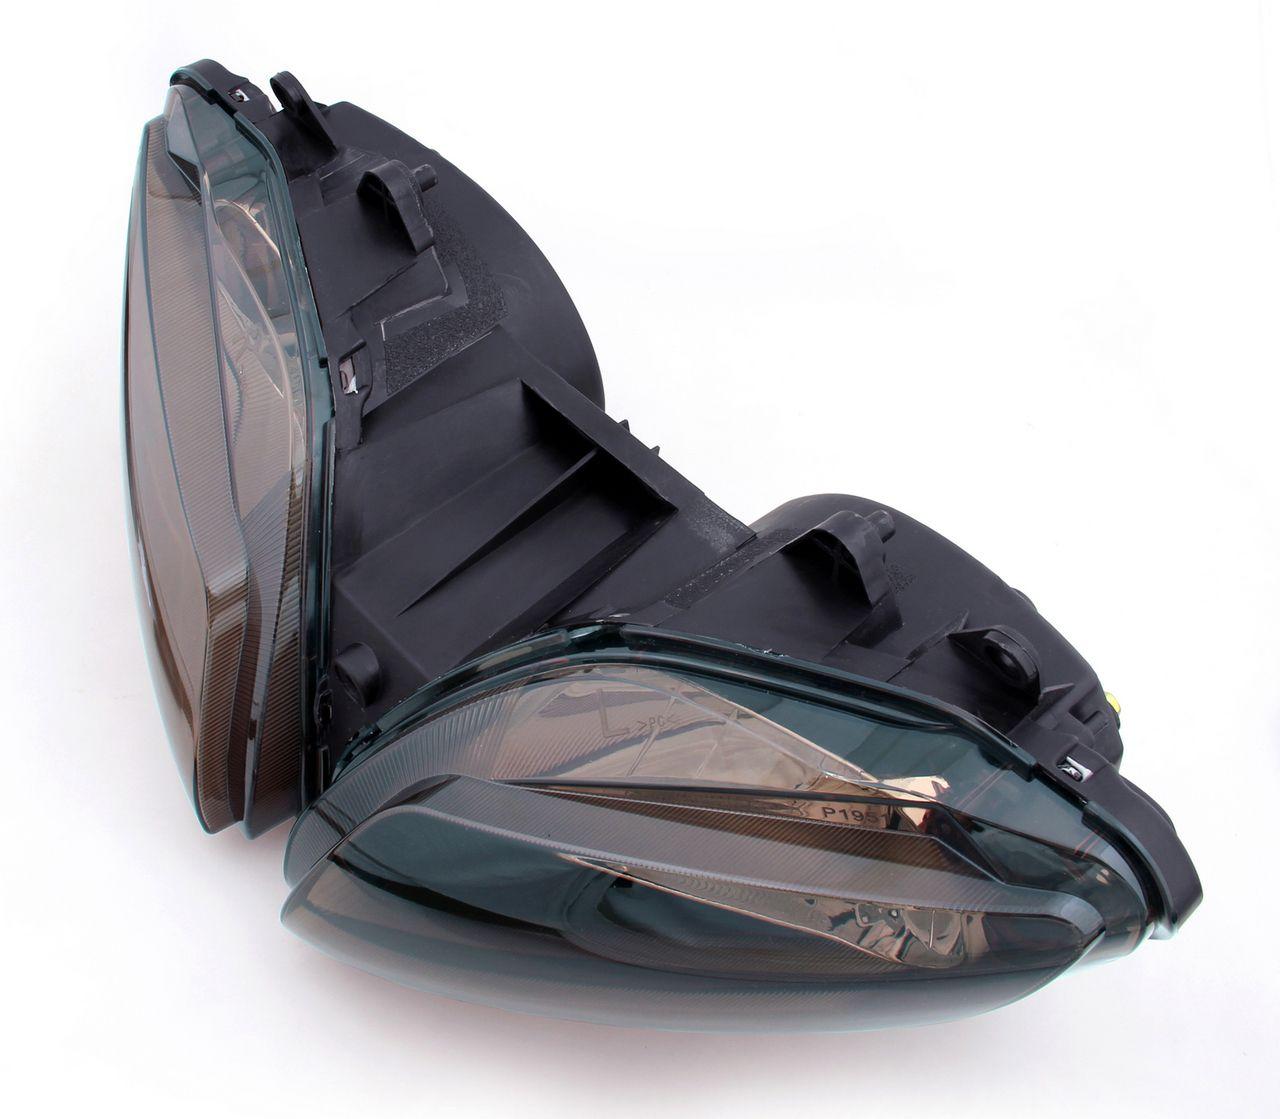 Headlight Yamaha Yzf R1 Smoke Lenses 2002 2003 Yamaha Yzf R1 Yamaha Yzf Yamaha